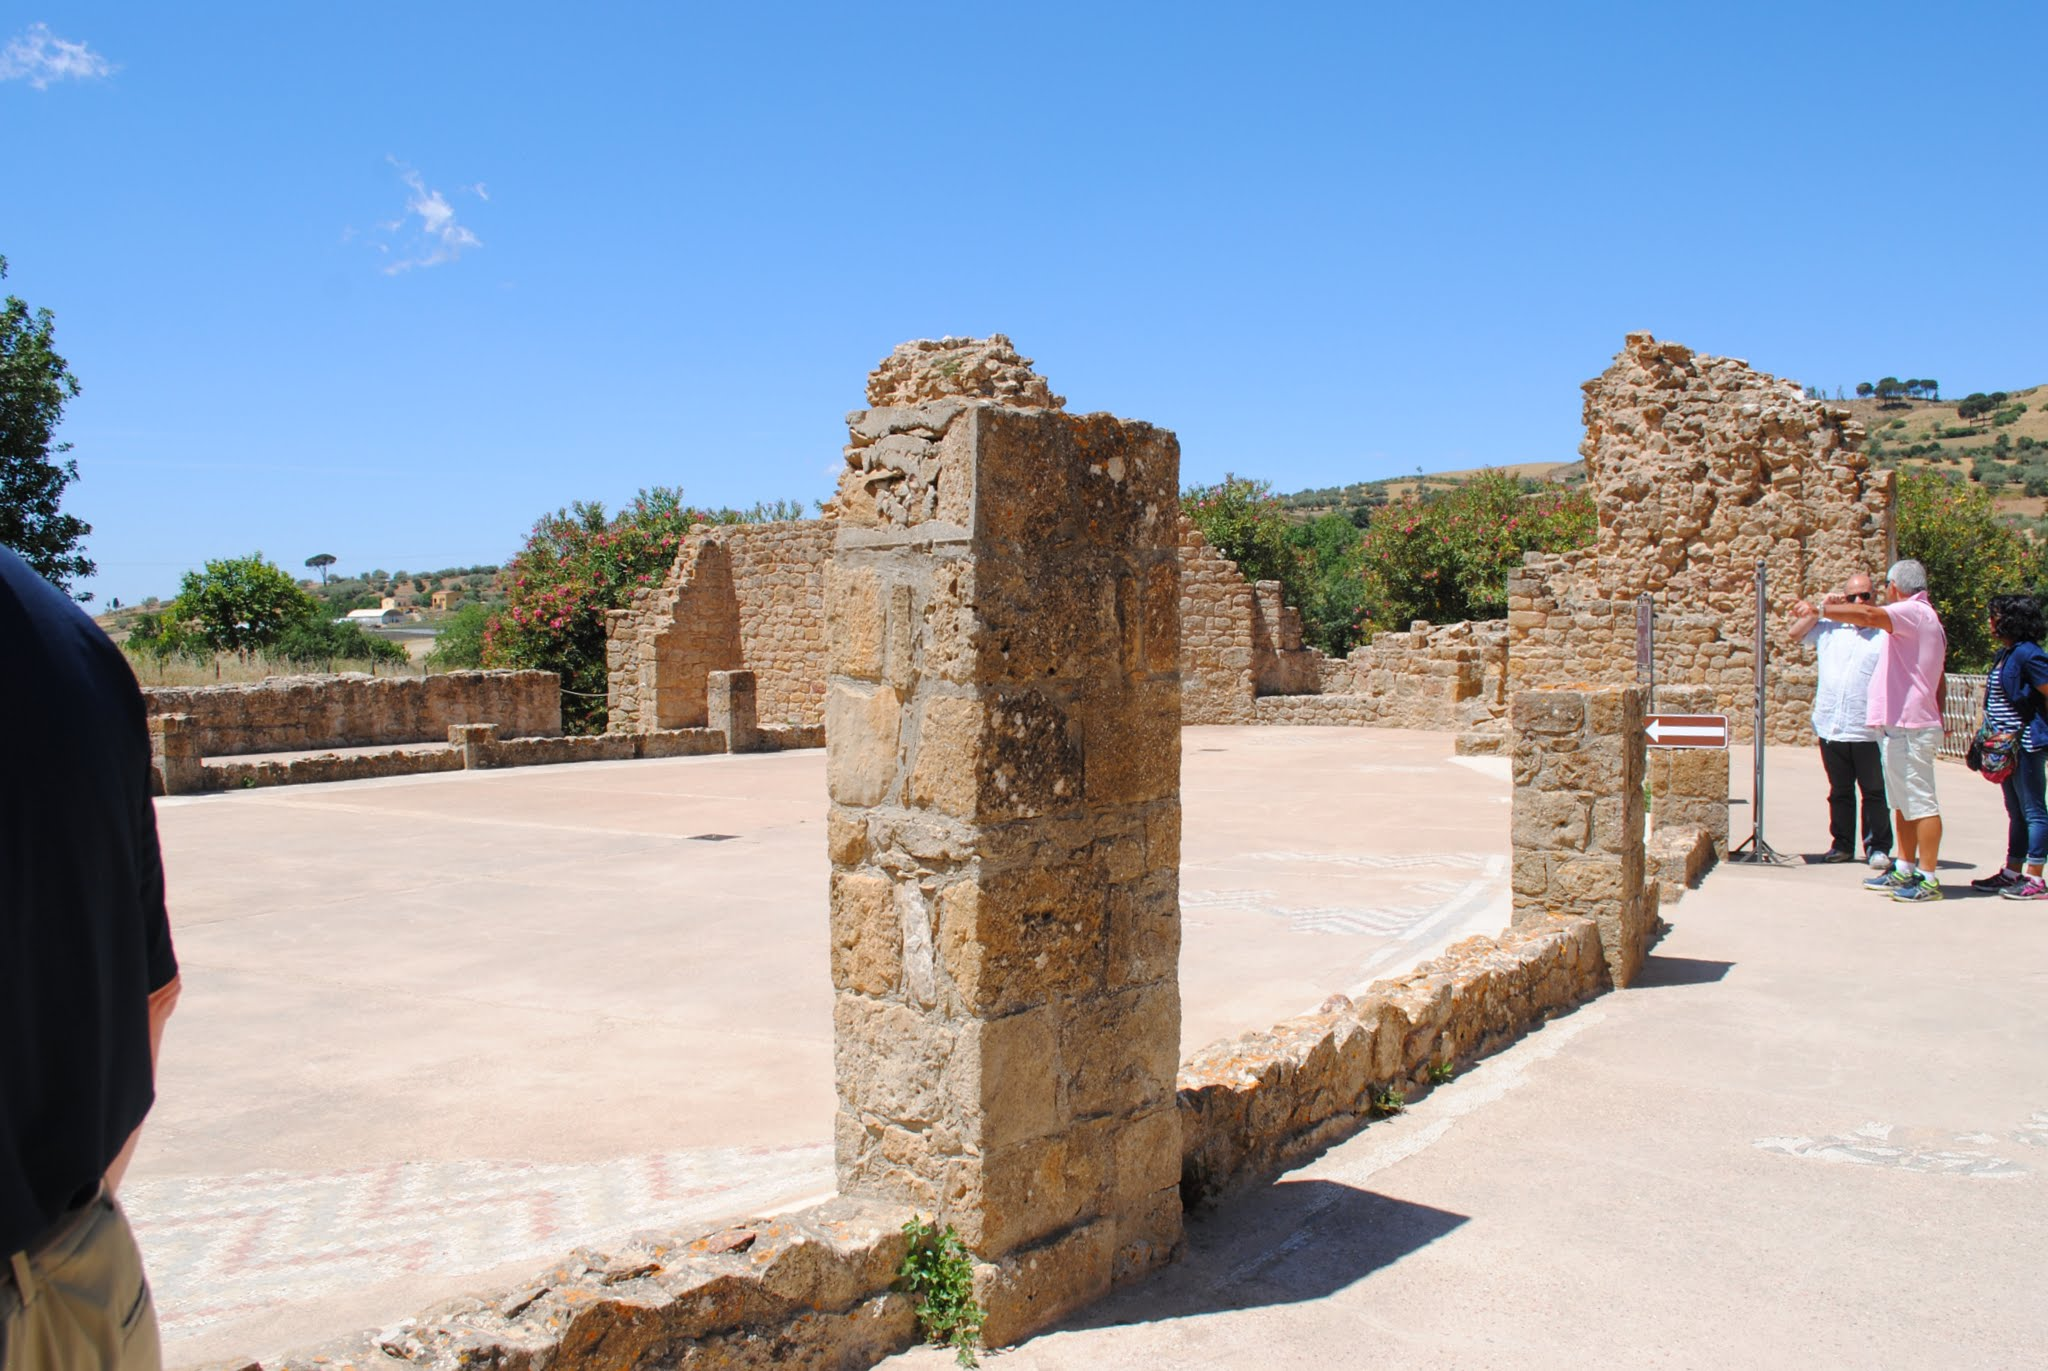 My Photos: Italy -- Mosaics -- Sicily -- Piazza Armerina -- Arcade & Courtyard